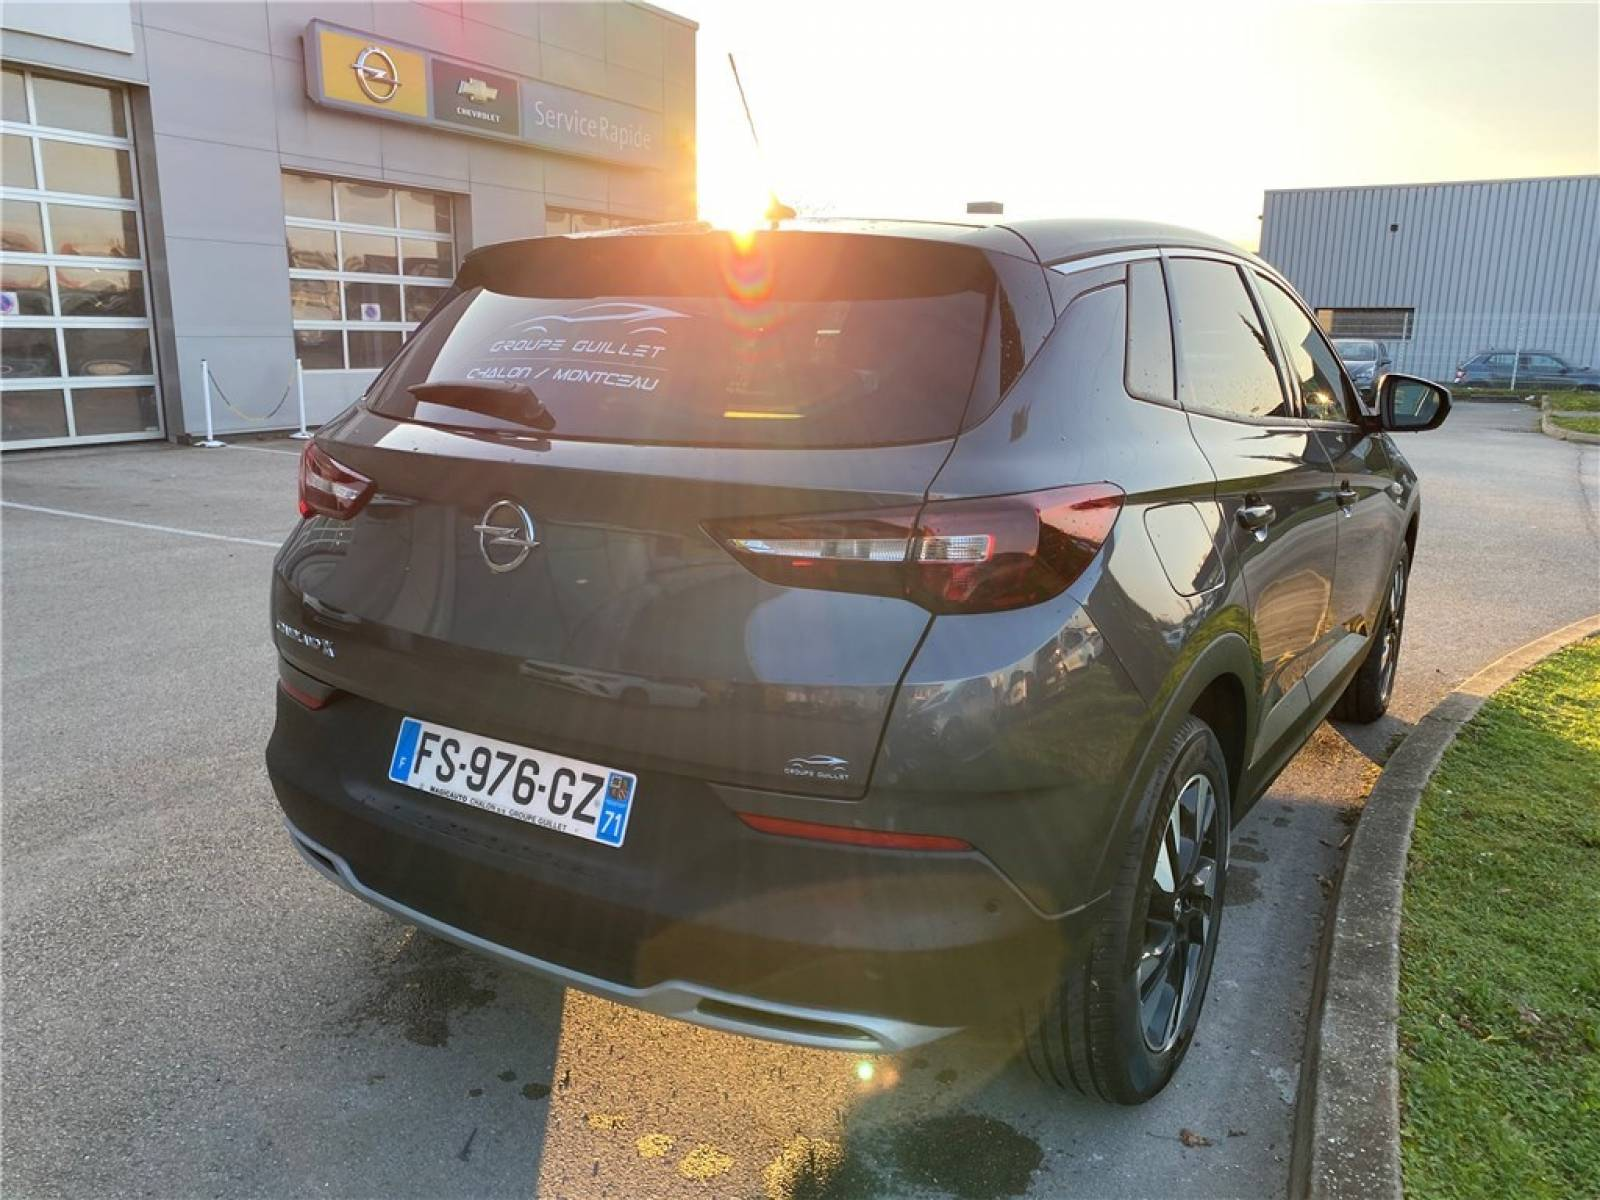 OPEL Grandland X 1.5 Diesel 130 ch BVA8 - véhicule d'occasion - Groupe Guillet - Opel Magicauto - Chalon-sur-Saône - 71380 - Saint-Marcel - 1